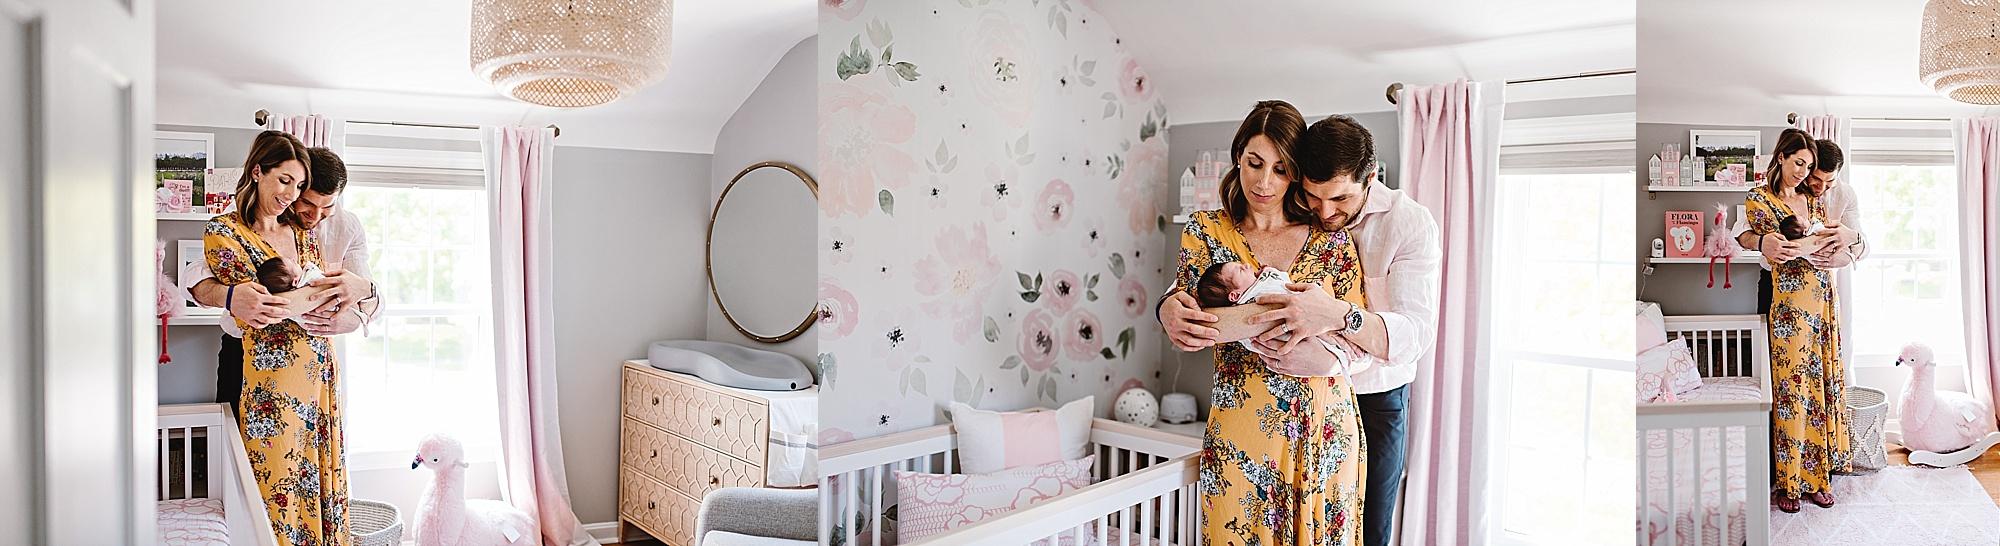 lauren-grayson-photography-cleveland-ohio-photographer-newborn-session-in-home-lifestyle-newborn-family-vivian_0653.jpg